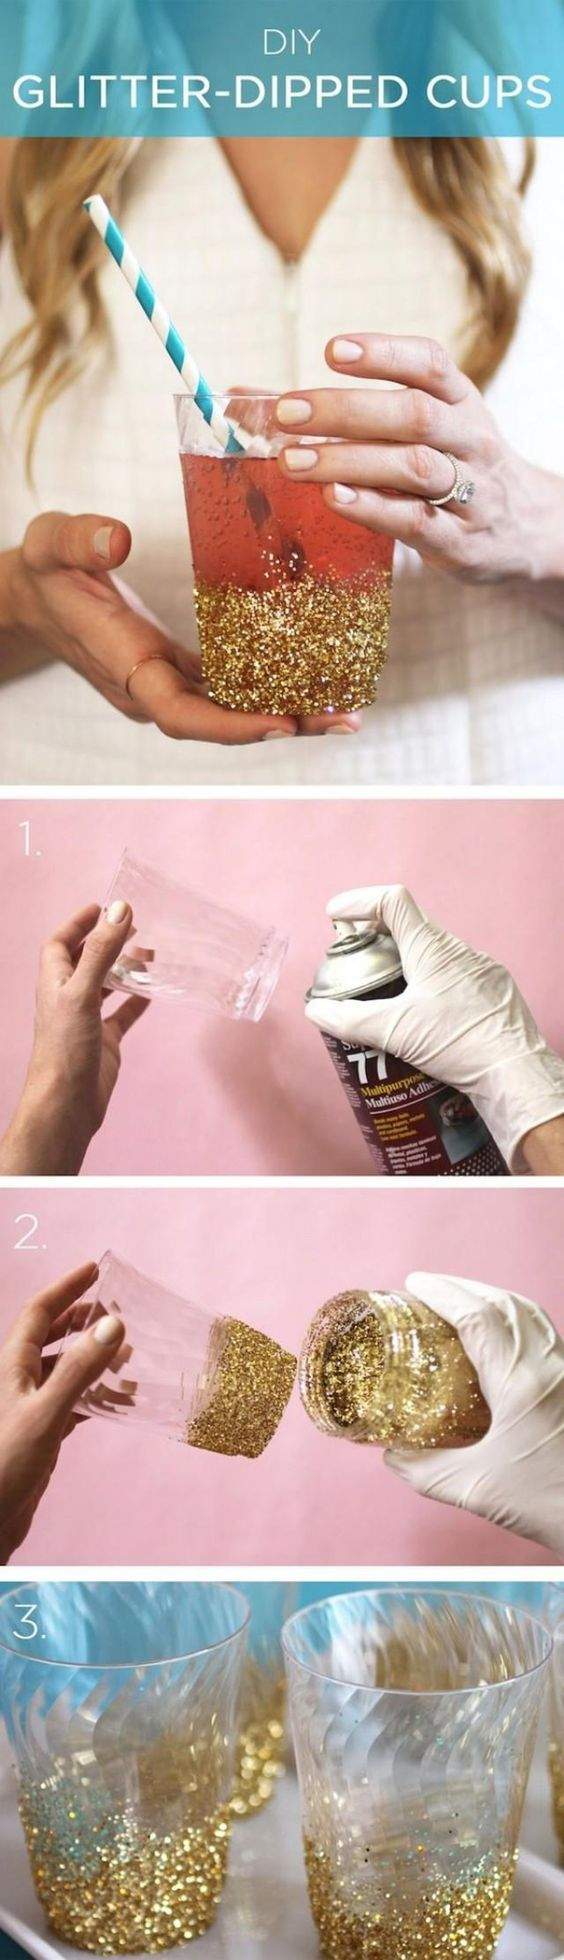 Glitzer Gläser zu Silvester selber machen